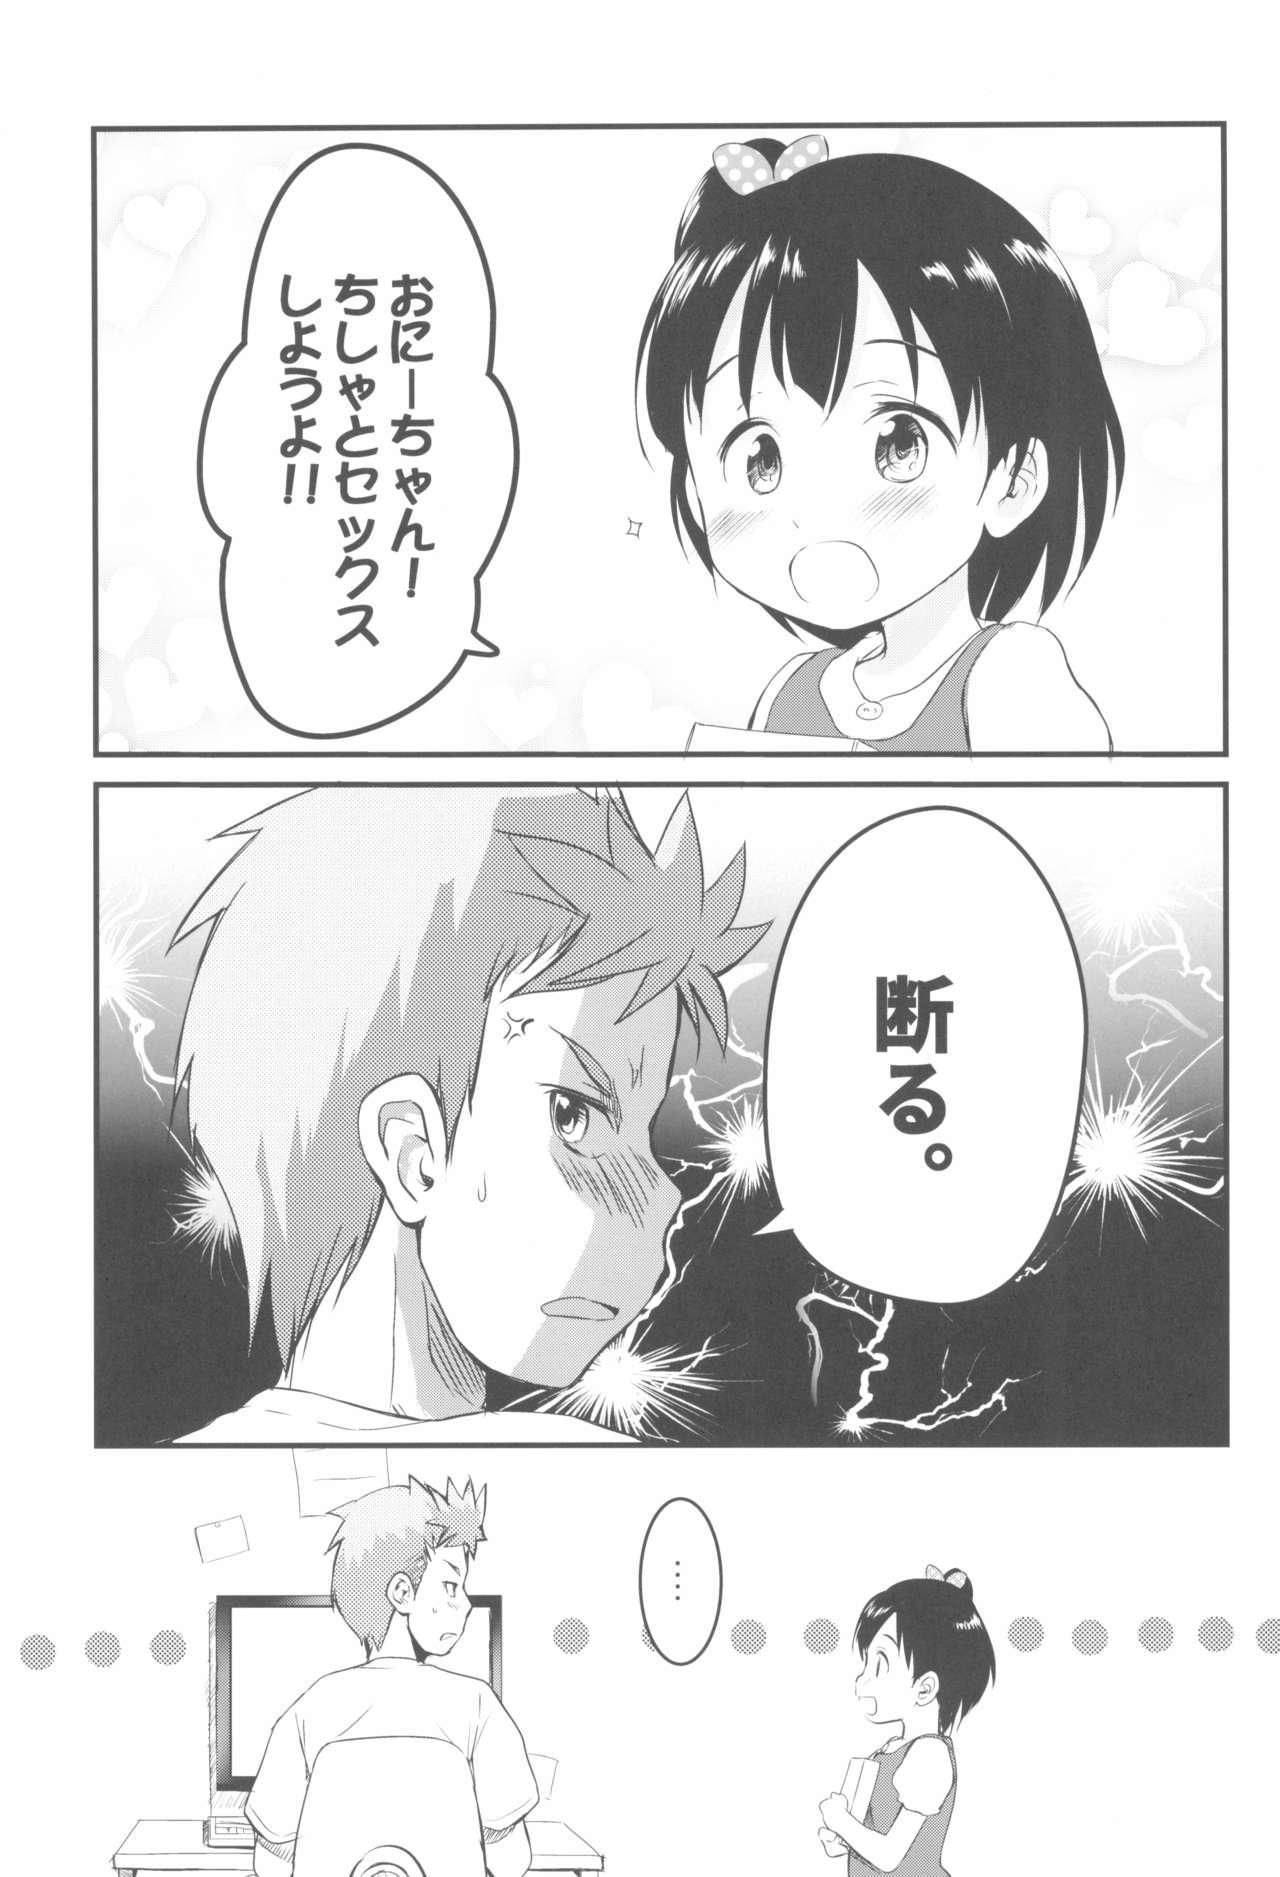 (C97) [Wancho-ke (Wancho)] Imouto wa Minna Onii-chan ga Suki! 5-Kaiteiban- 4